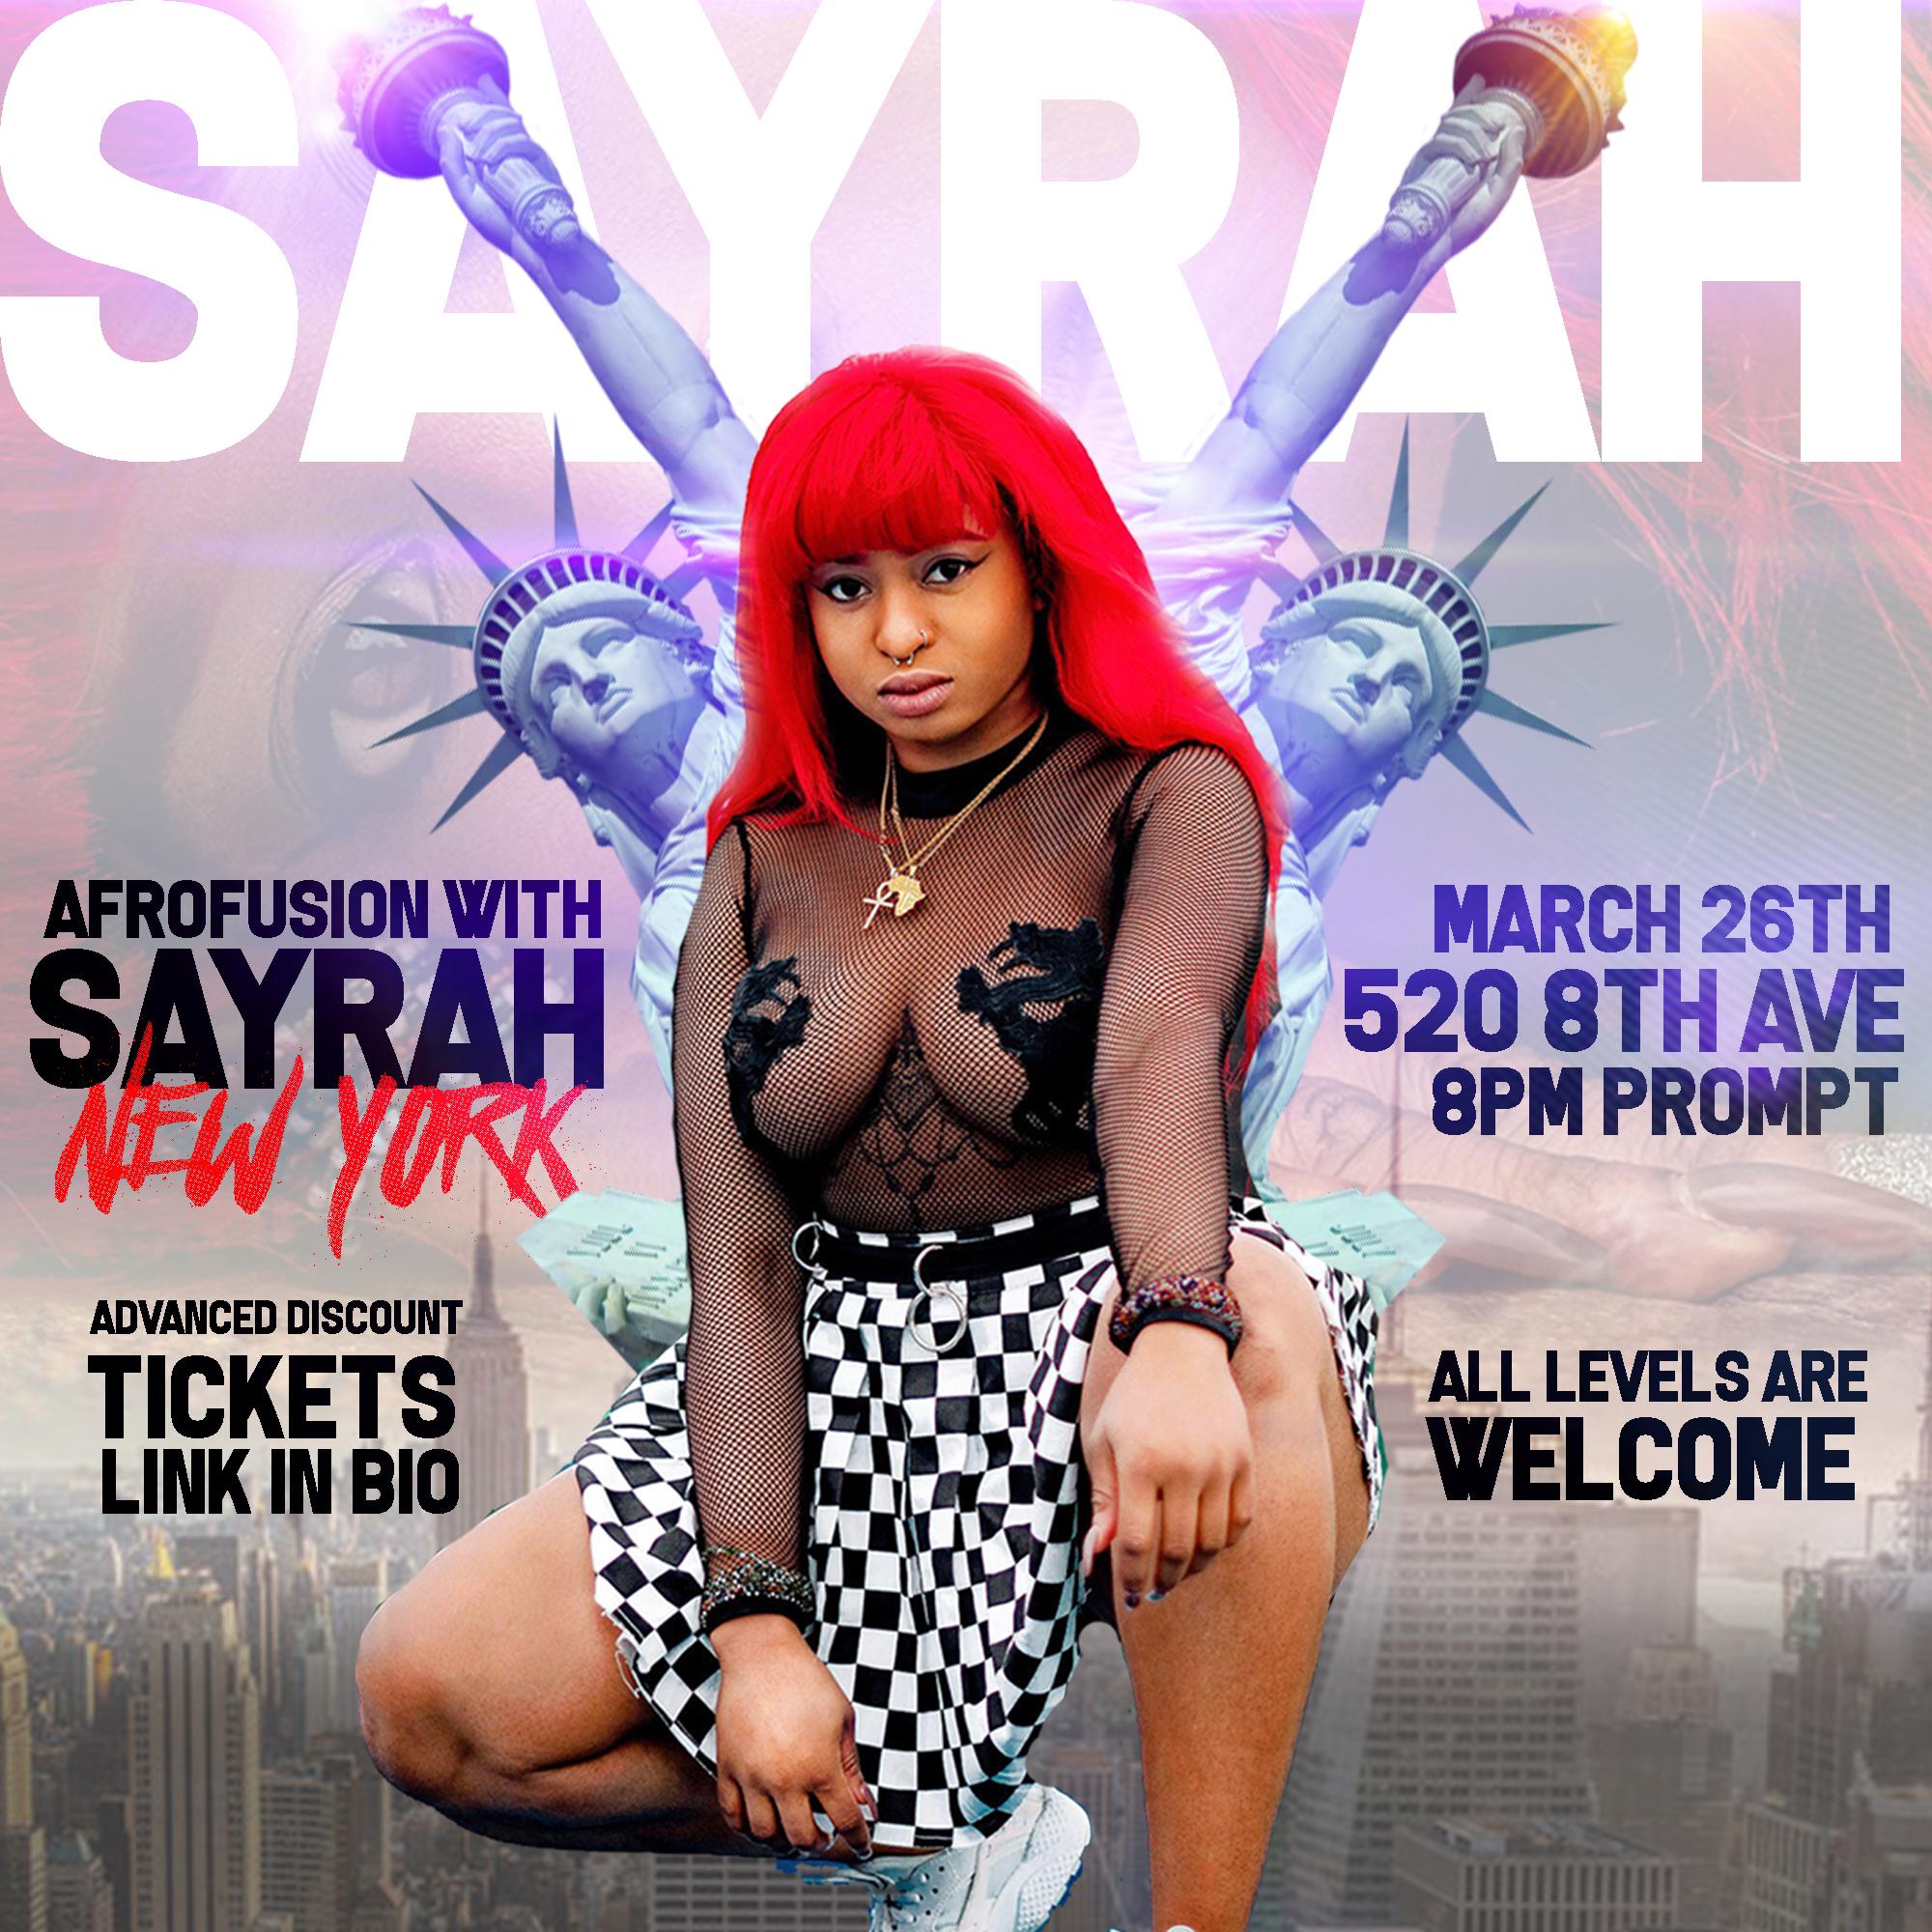 AfroFusion with SayRah NewYork